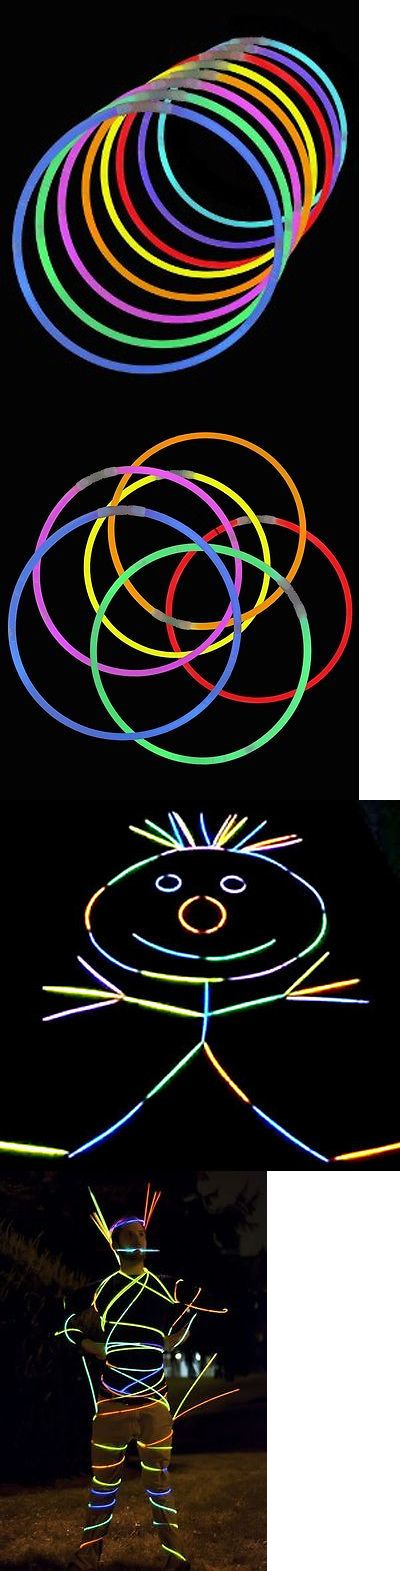 Novelty Vending Toys 51025: Weglow Brand Glow Stick Necklaces: 300 Pc, 22 Inch, Huge 6Mm Size, *Video* -> BUY IT NOW ONLY: $82.52 on eBay!